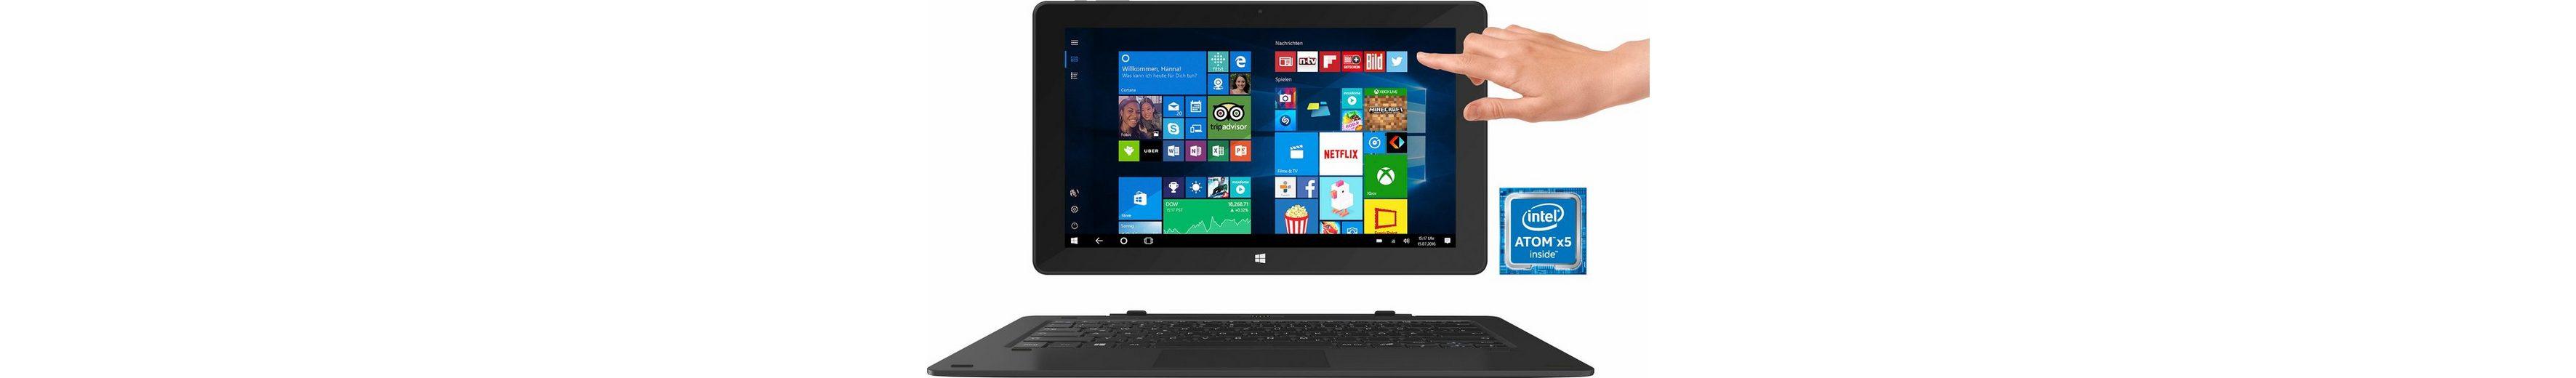 TrekStor SurfTab twin 11,6 LTE - Volks-Tablet Tablet-PC, Microsoft® Windows® 10 Home, Quad-Core